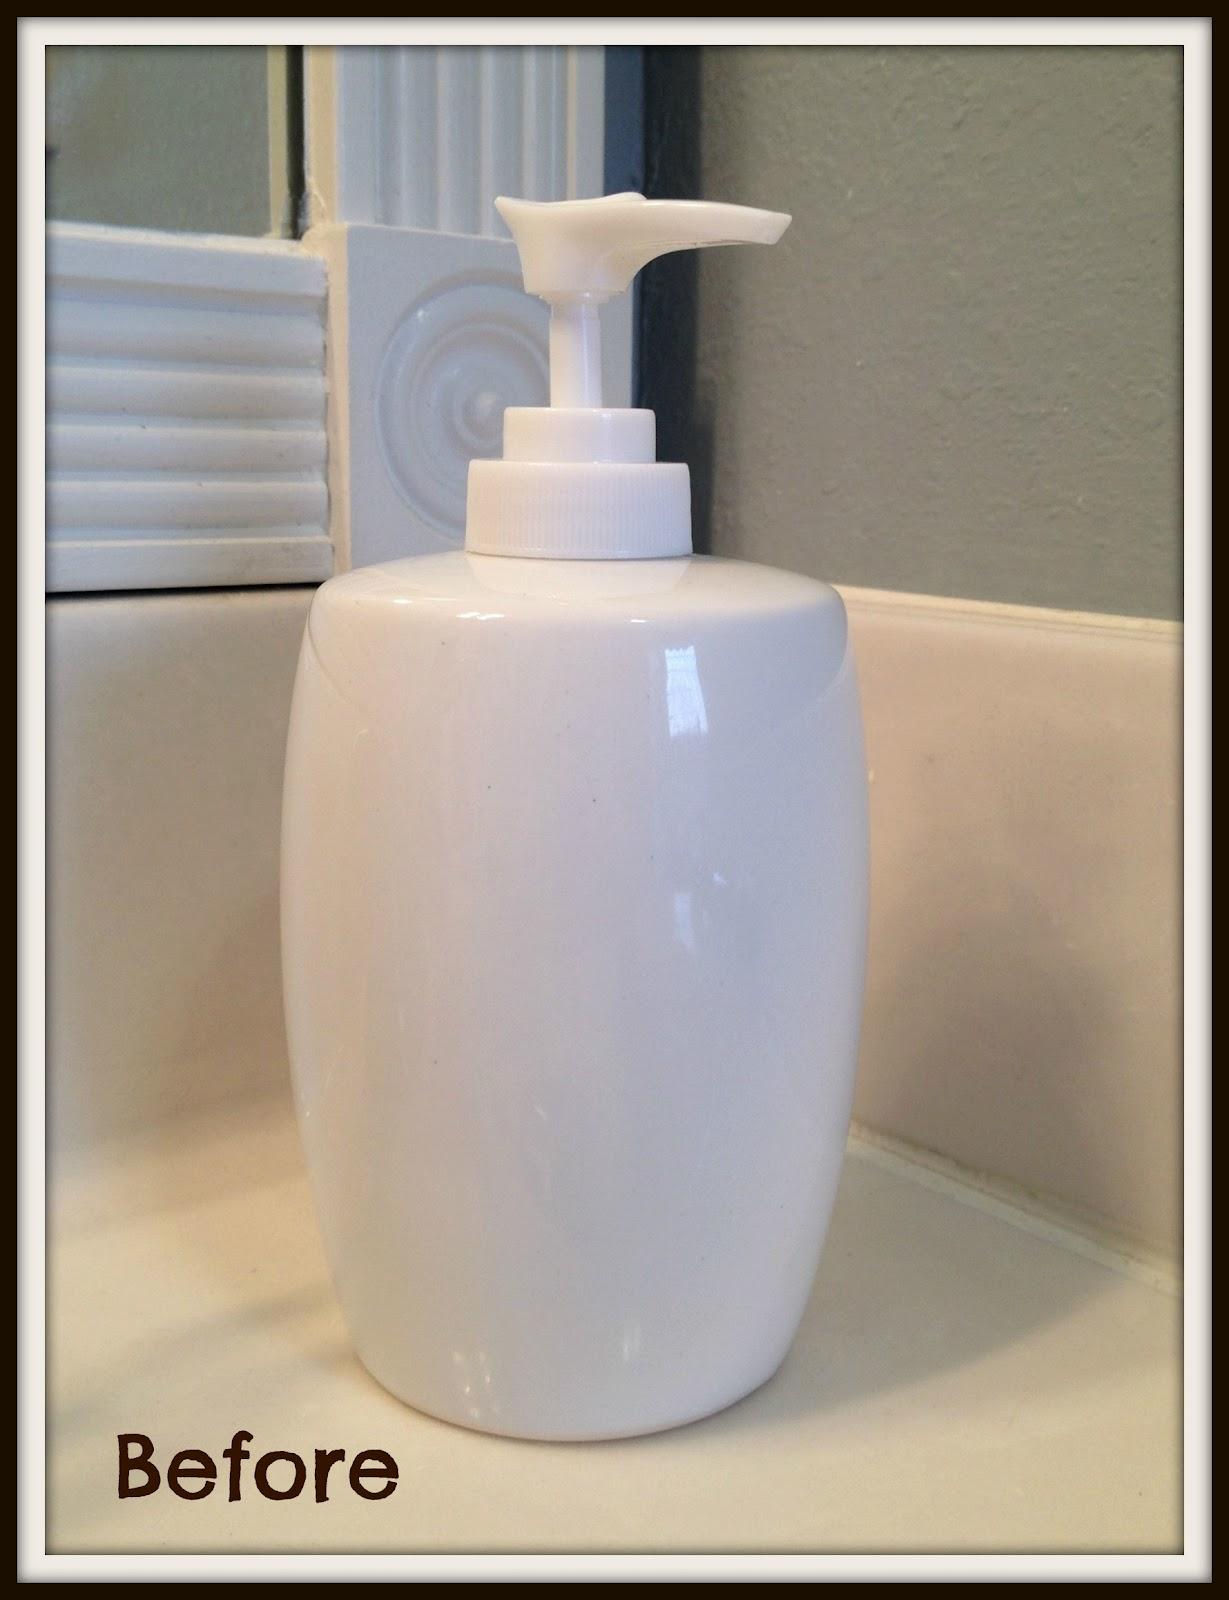 Crafty in Crosby Bathroom Soap Dispenser